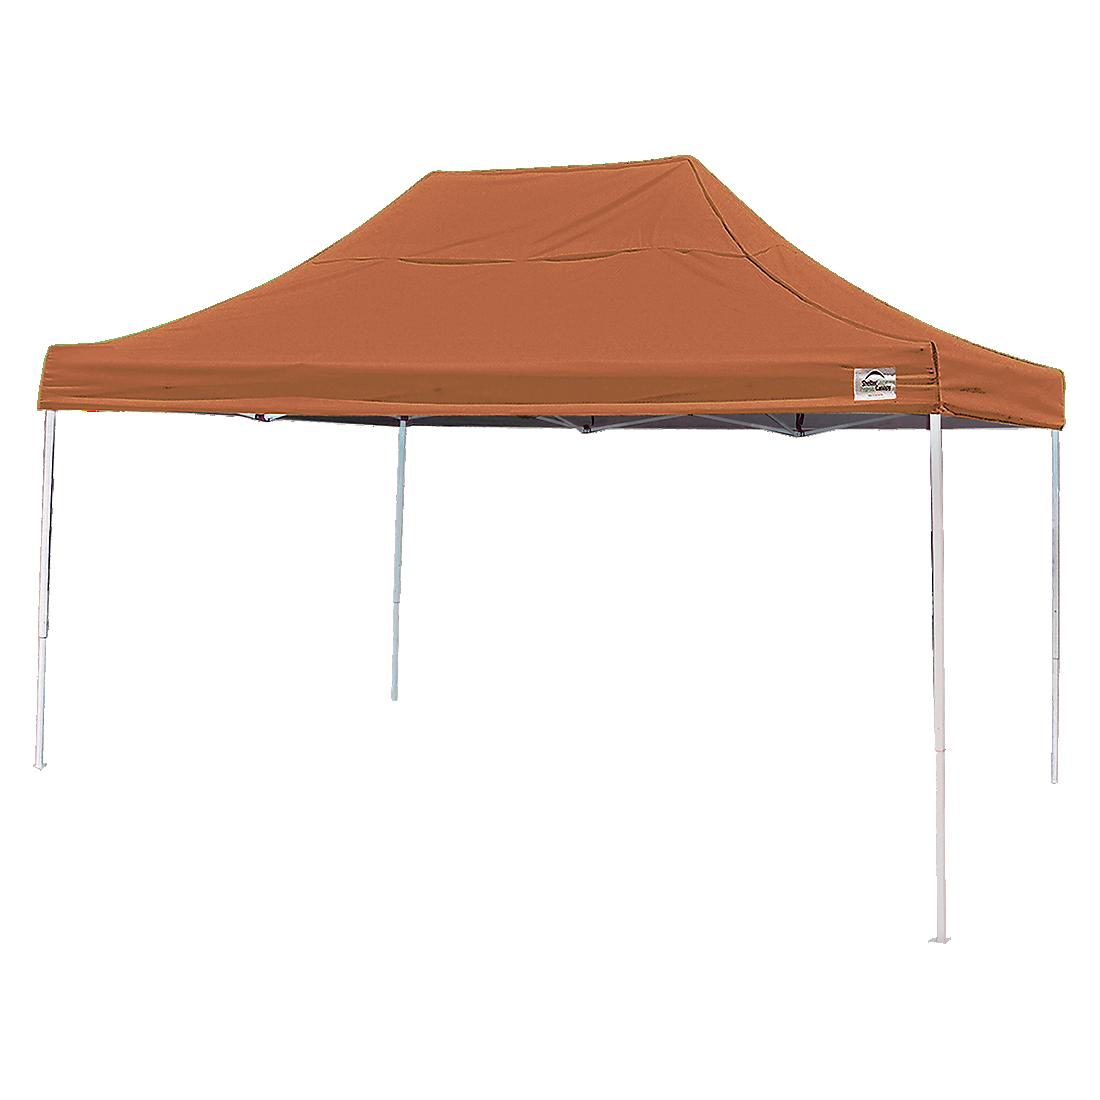 Straight Leg Canopy